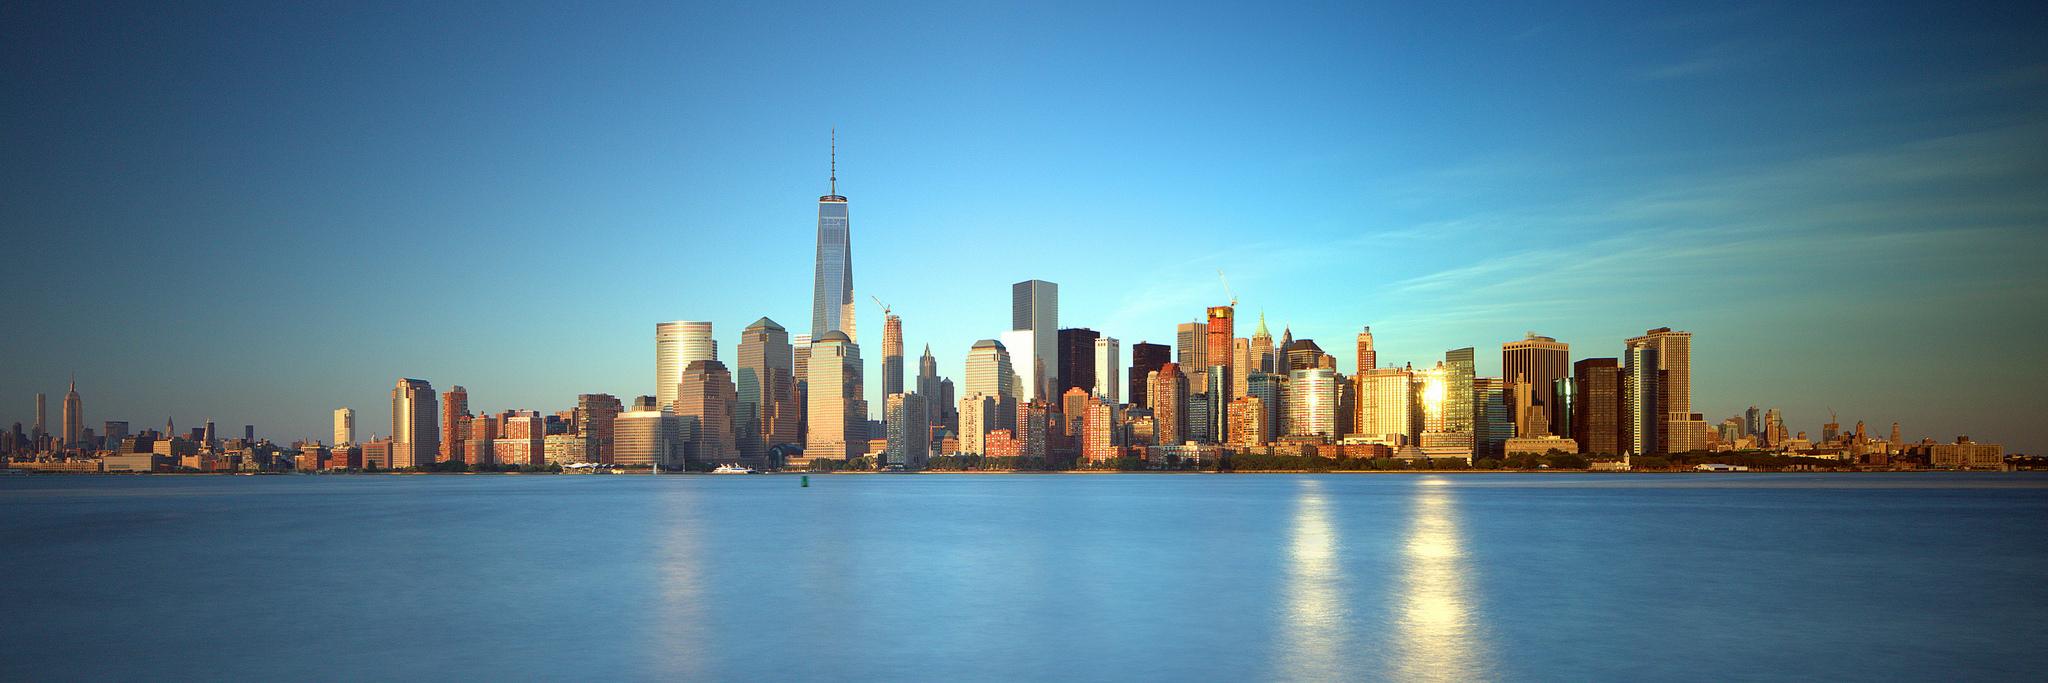 Manhattan from Liberty State Park, NJ, golden hour | © John Cunniff/Flickr